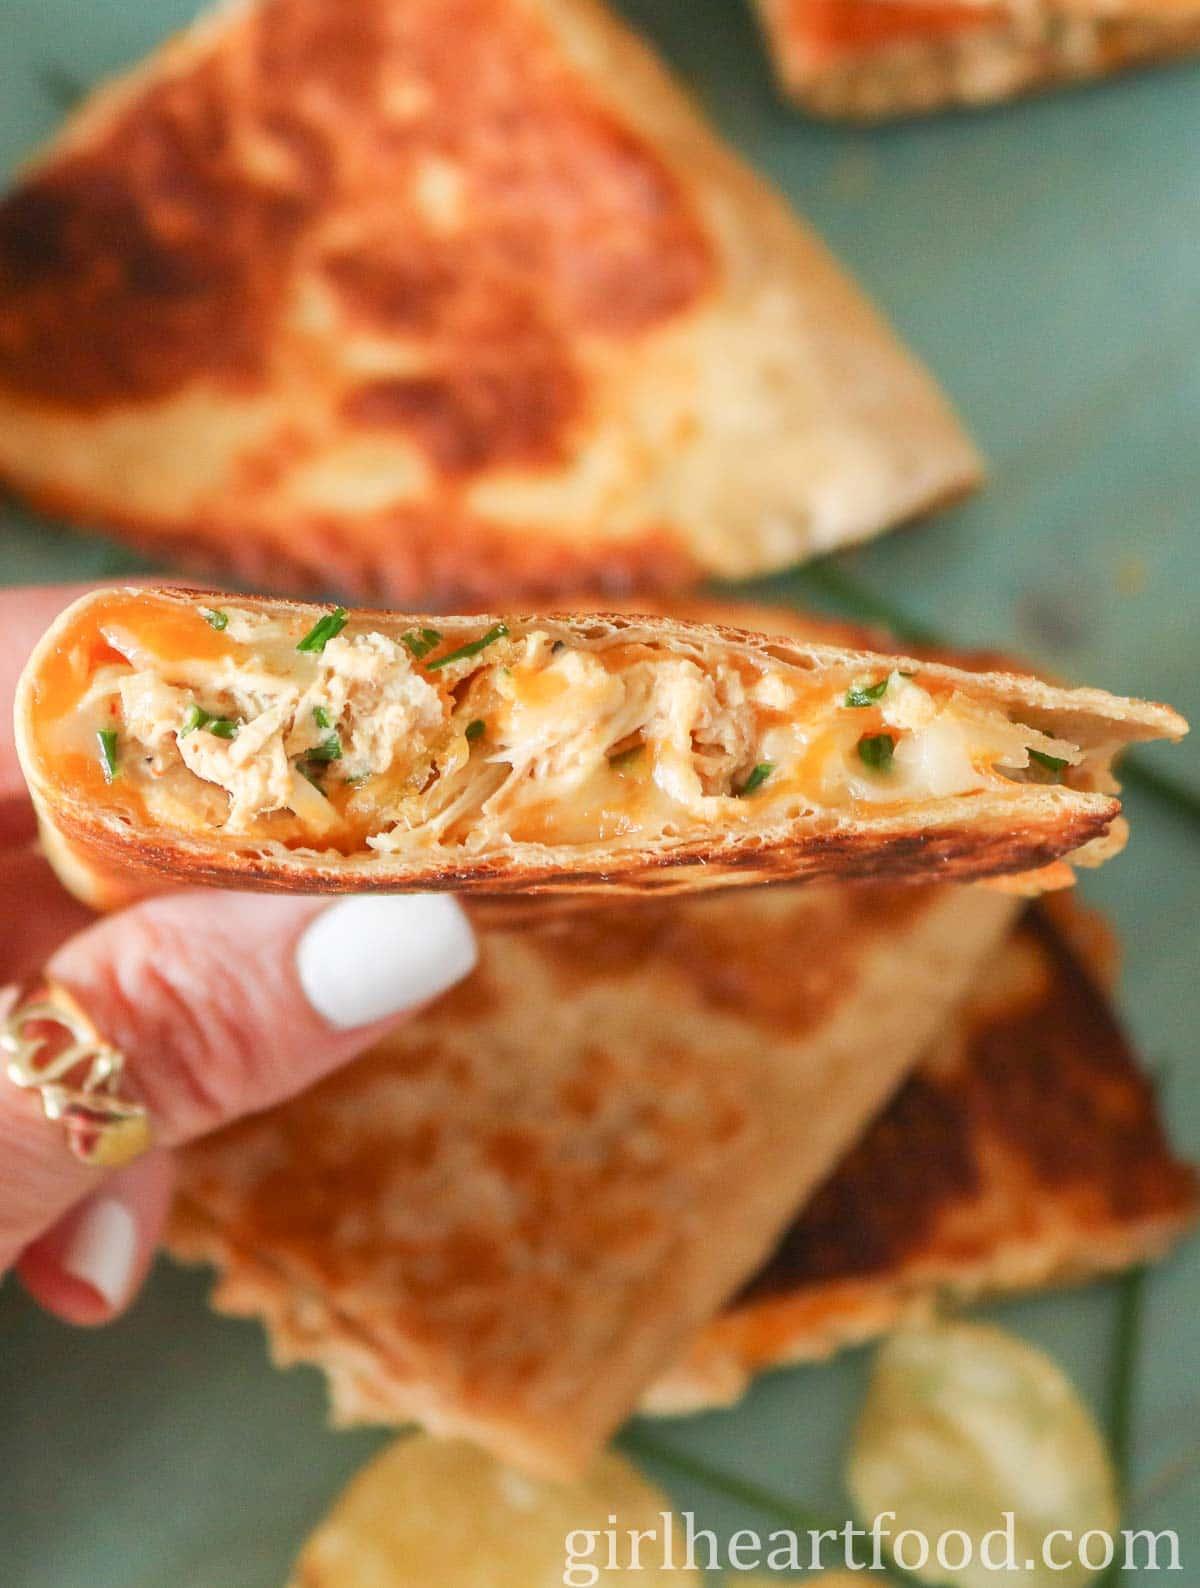 Hand holding a cheesy tuna quesadilla.